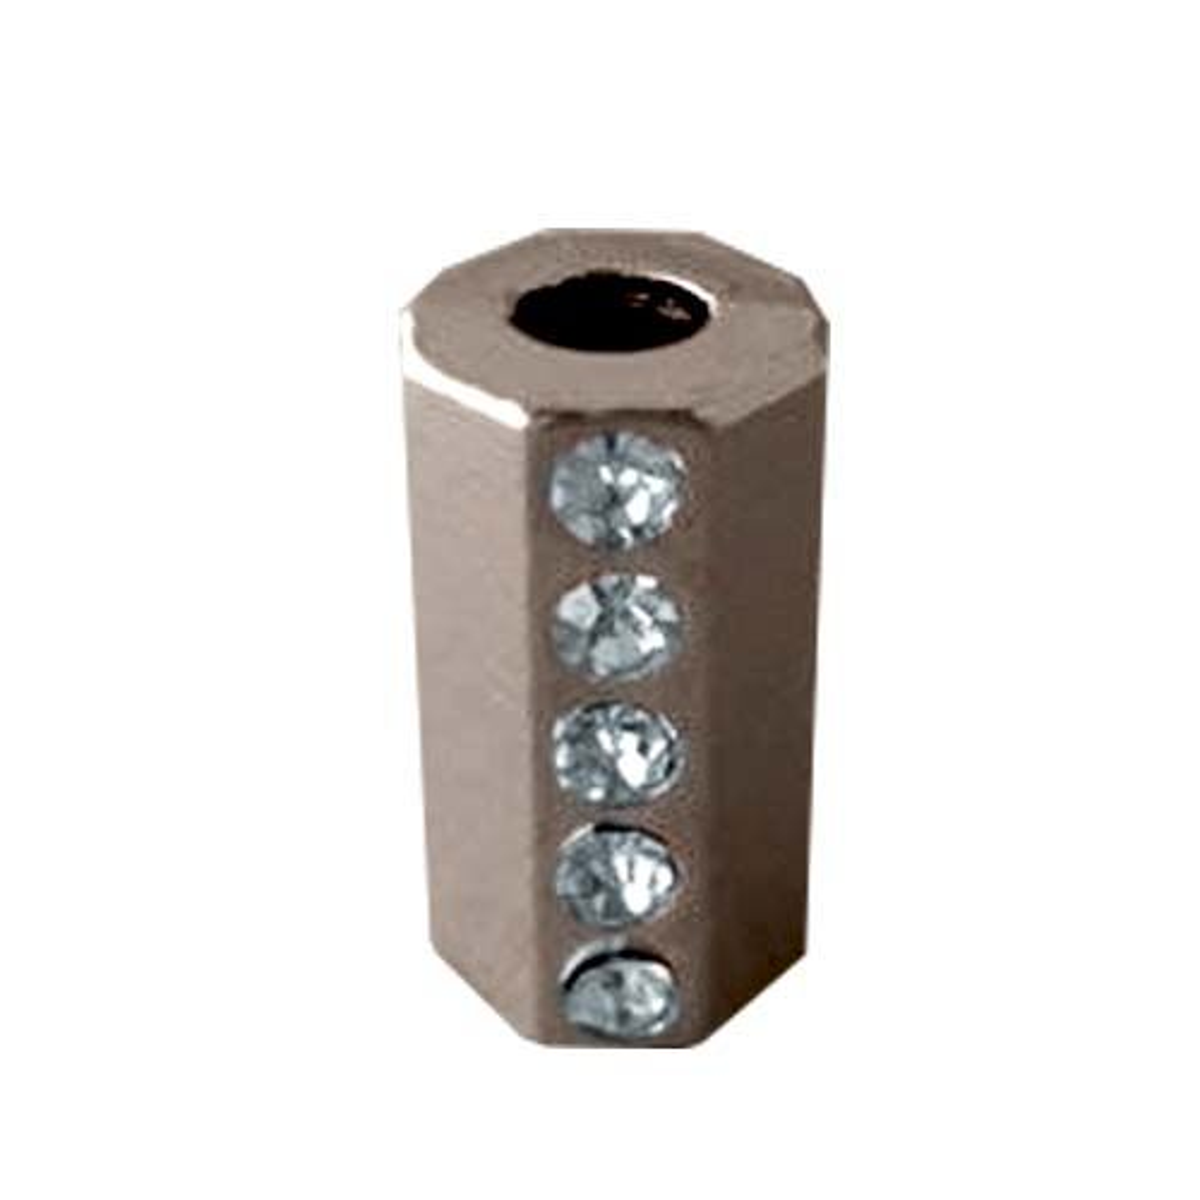 ГФУ6103 Наконечник 'Цилиндр' со стразами d=3,5/7мм, 15,5*8,5мм, металл